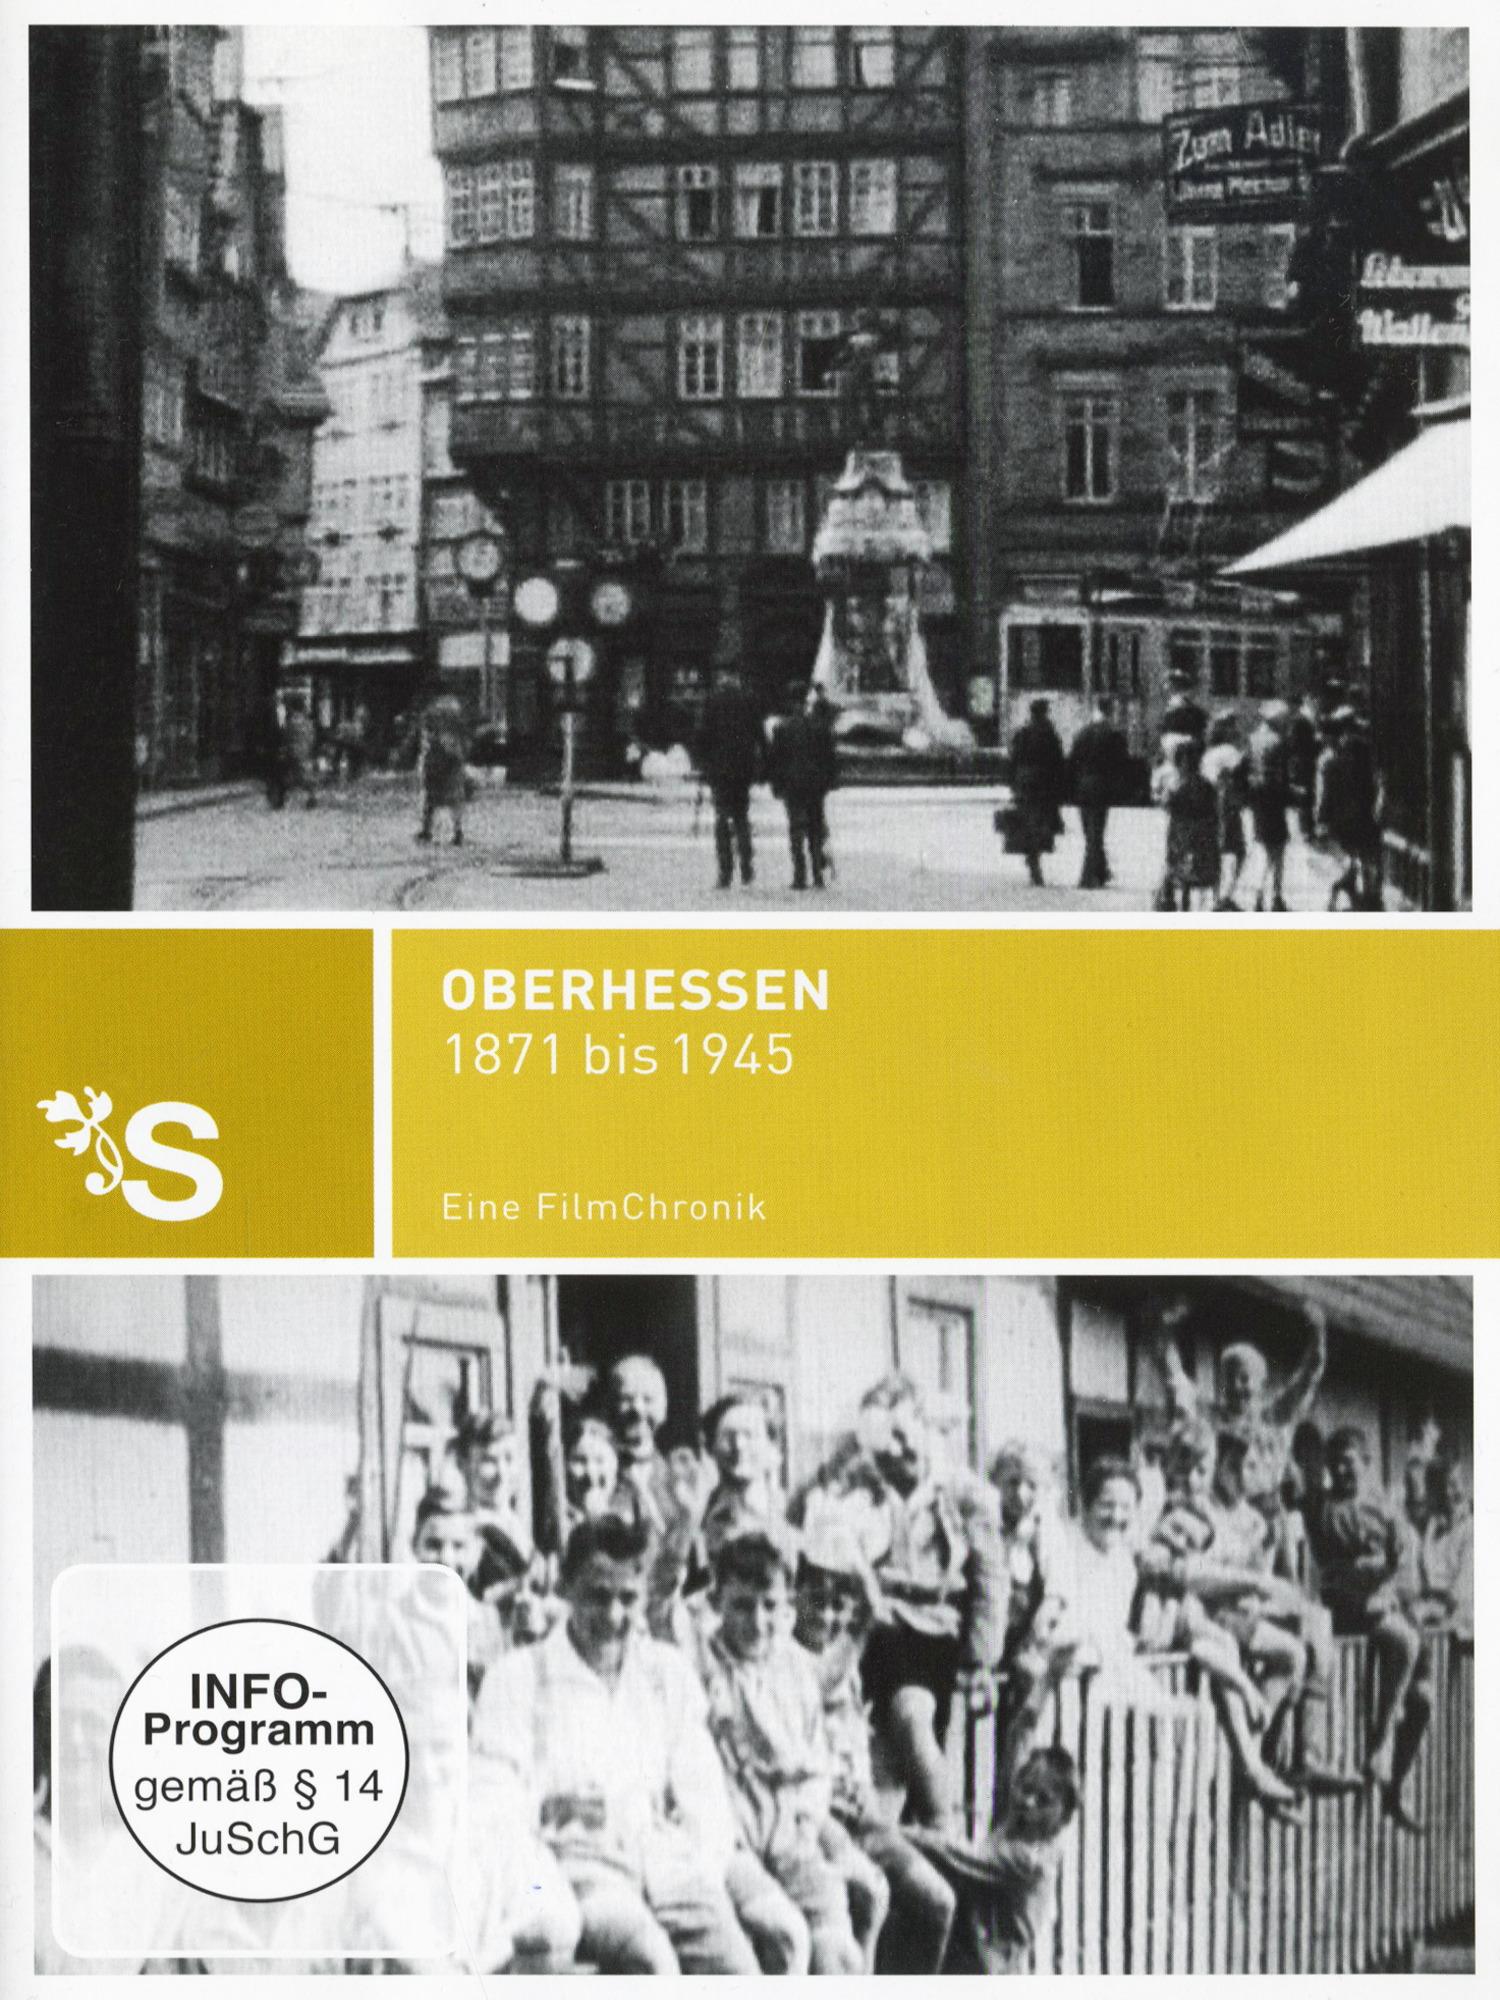 Oberhessen 1871 bis 1945